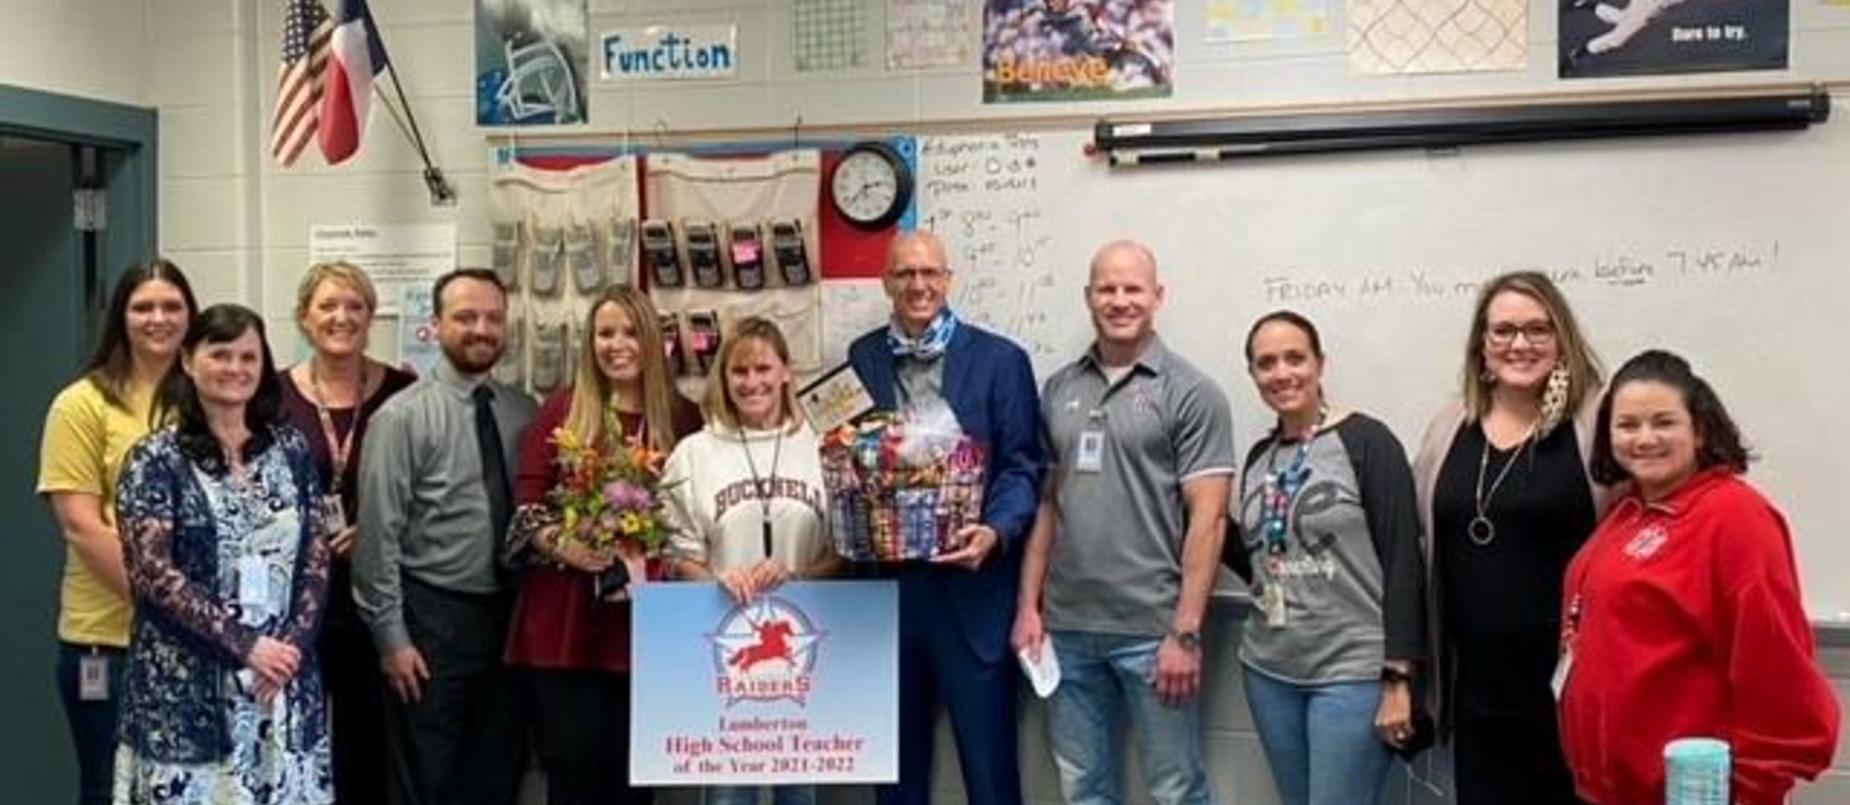 Congratulations Ms. McLain